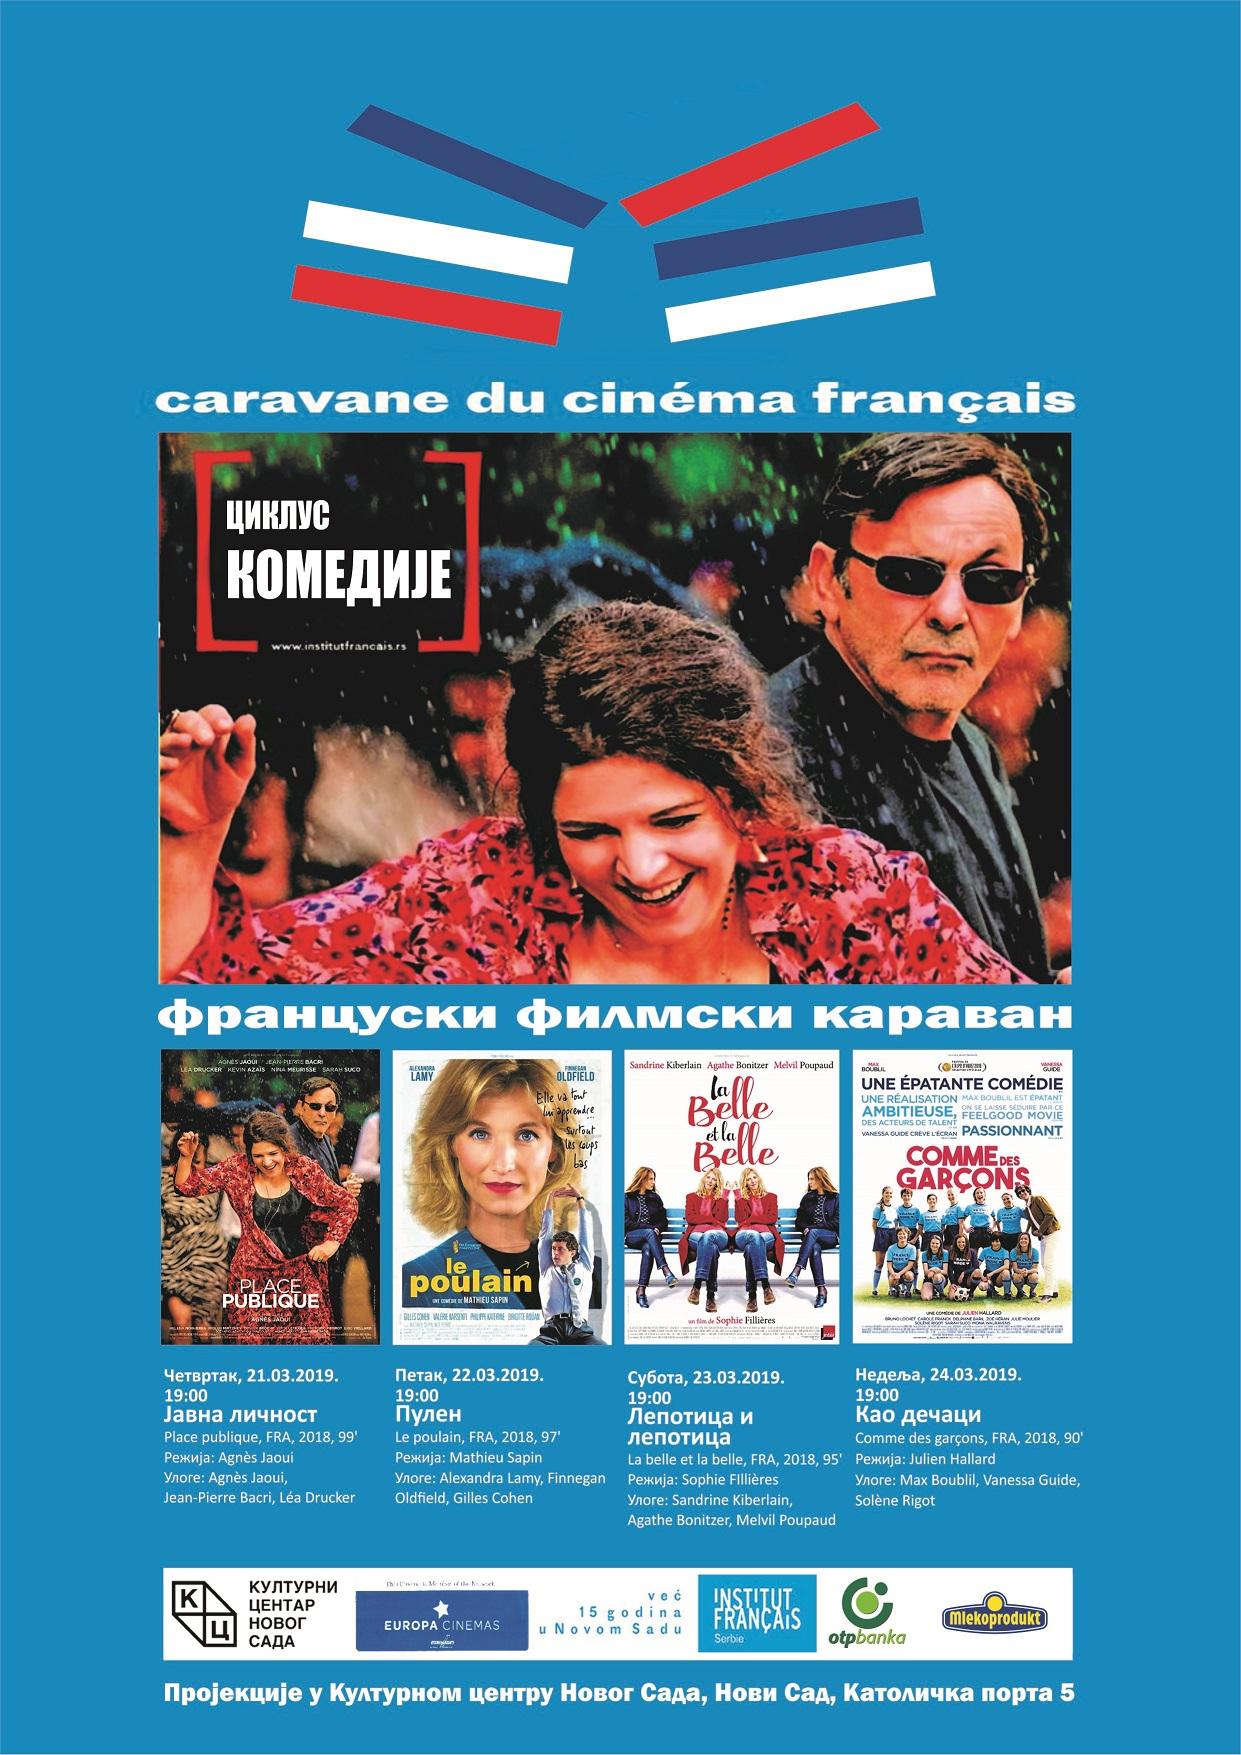 FRANCUSKI FILMSKI KARAVAN 2019. OD 21. MARTA U KCNS